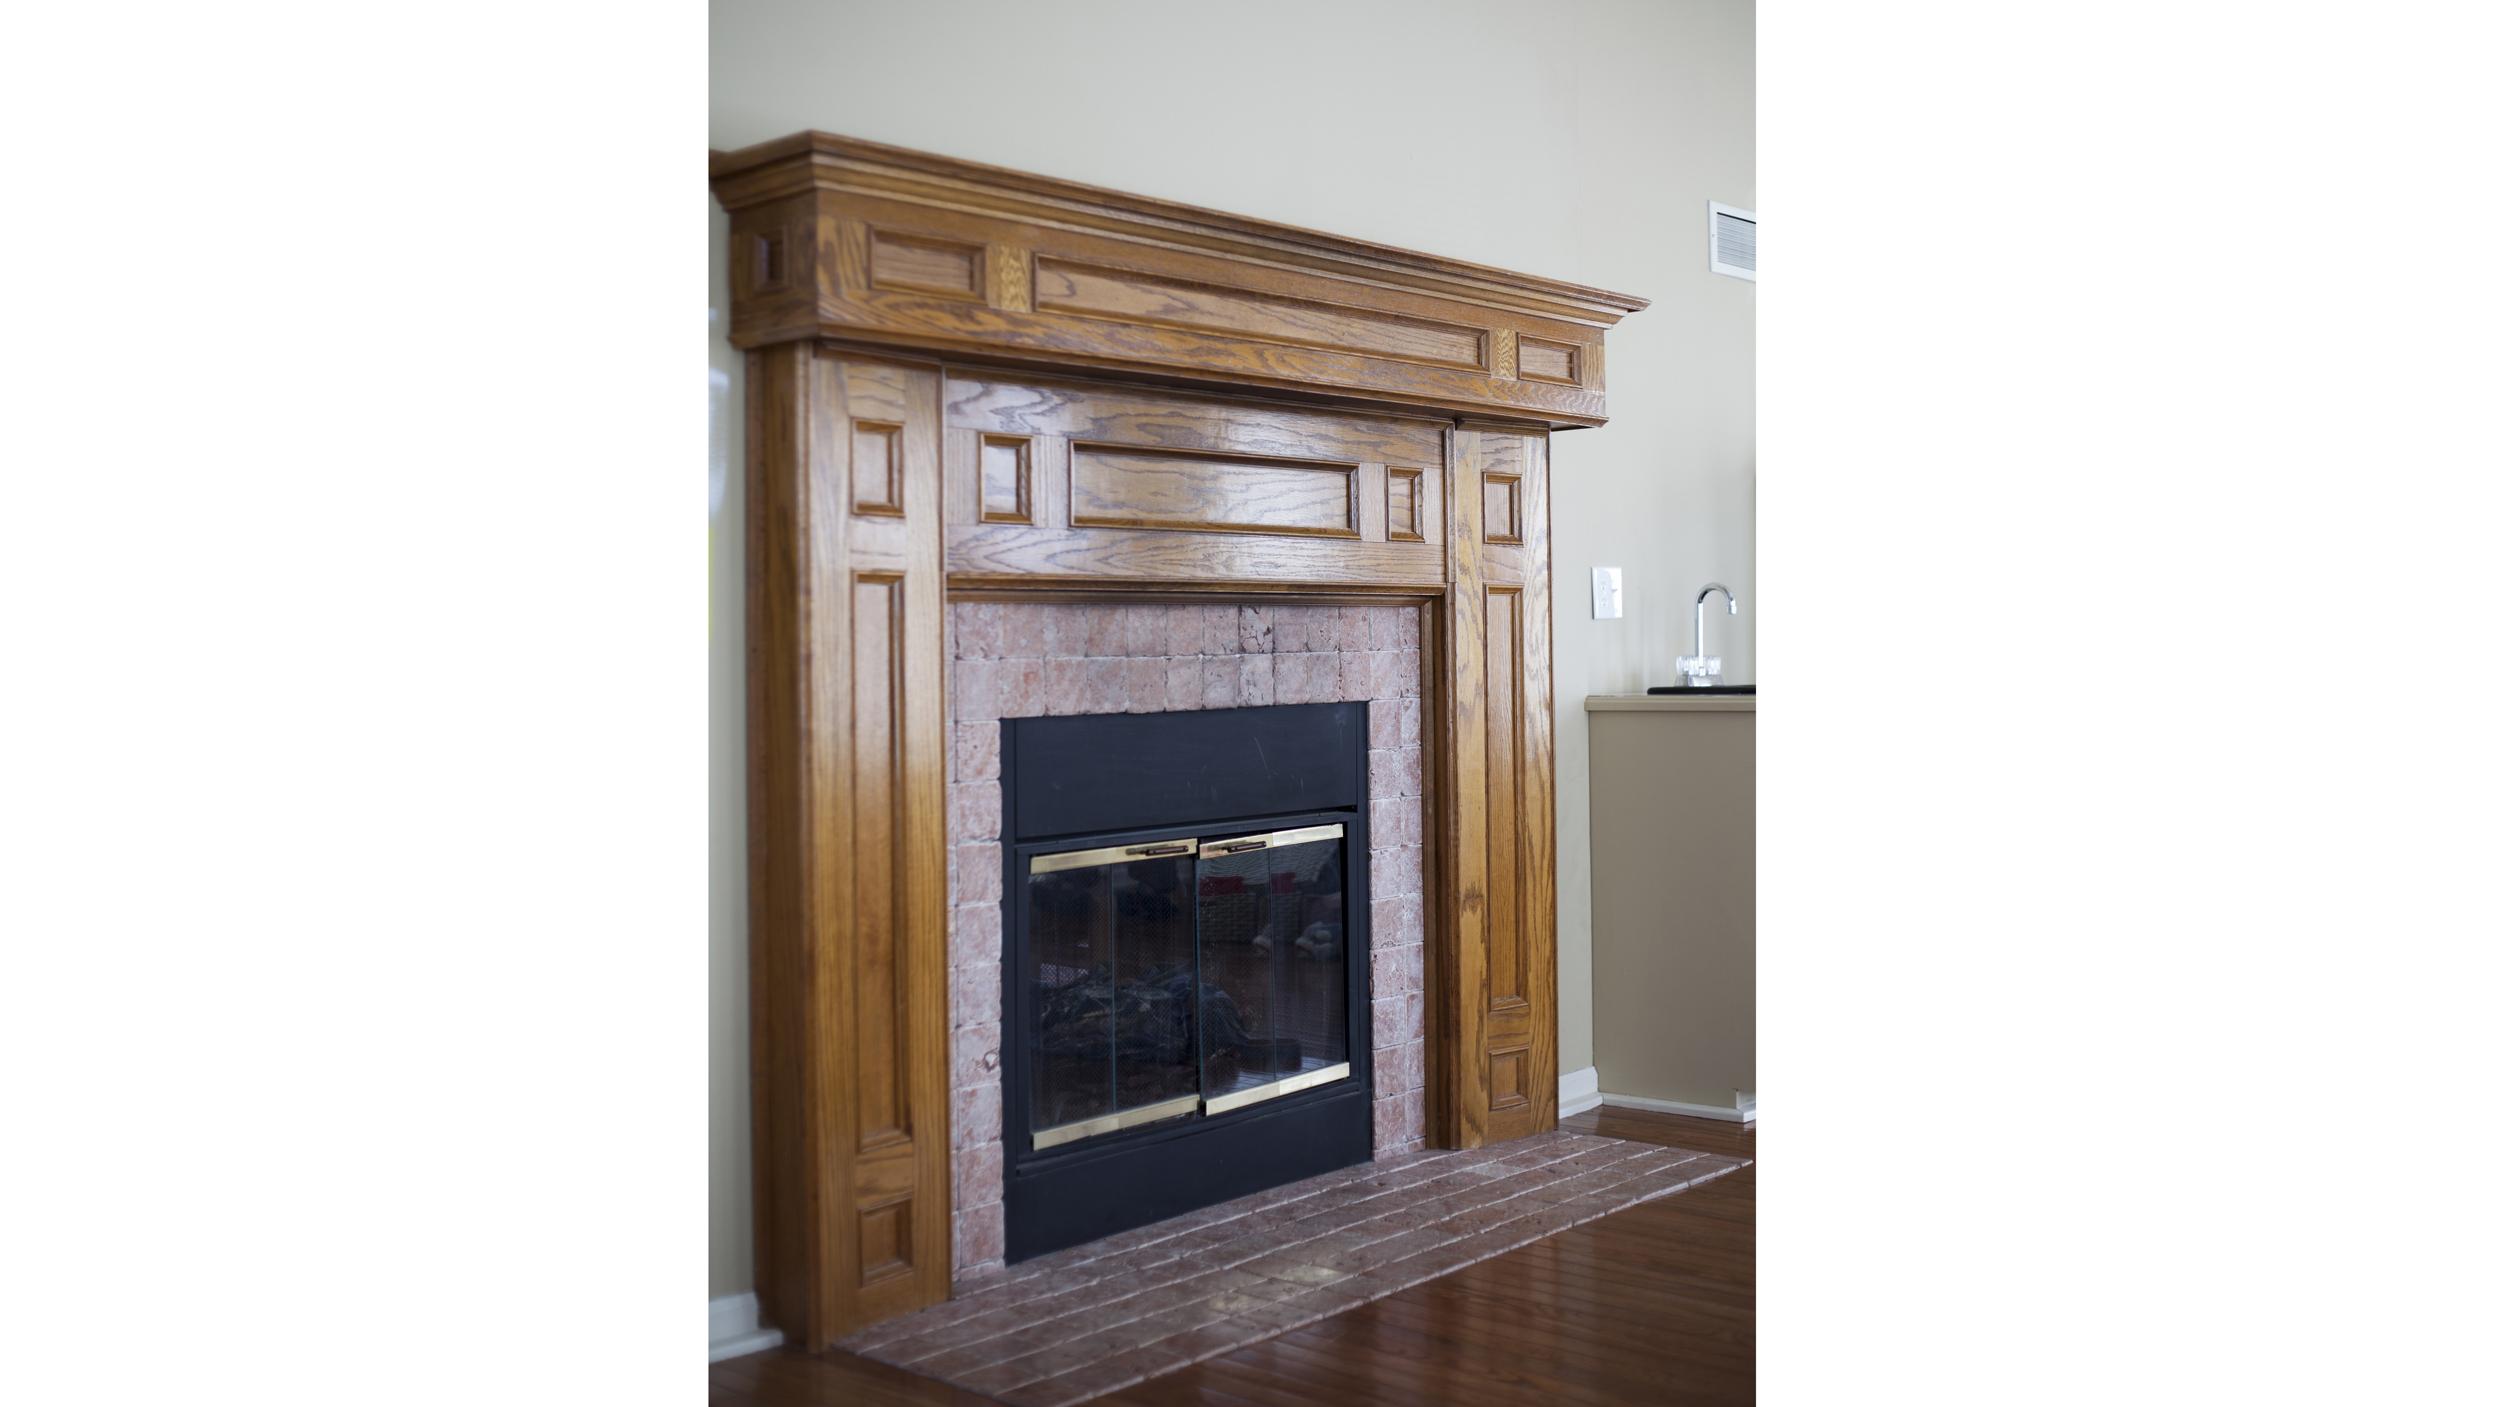 The Makerista Blogger Gwen Hefner Gives Fireplace A Diy